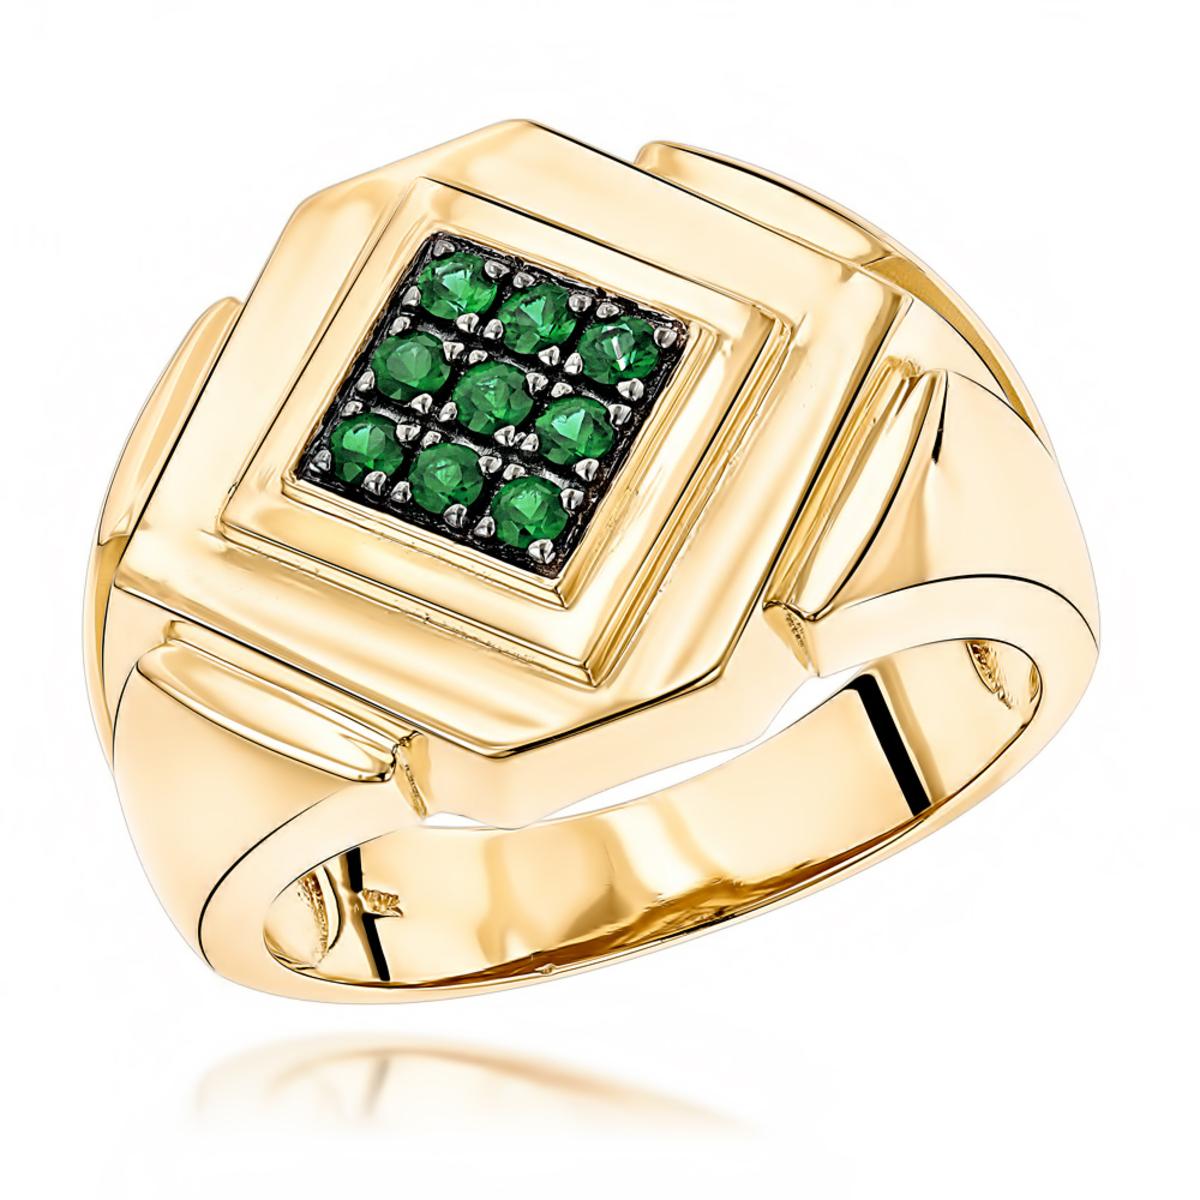 14K Gold Emerald Mens Ring by Luxurman